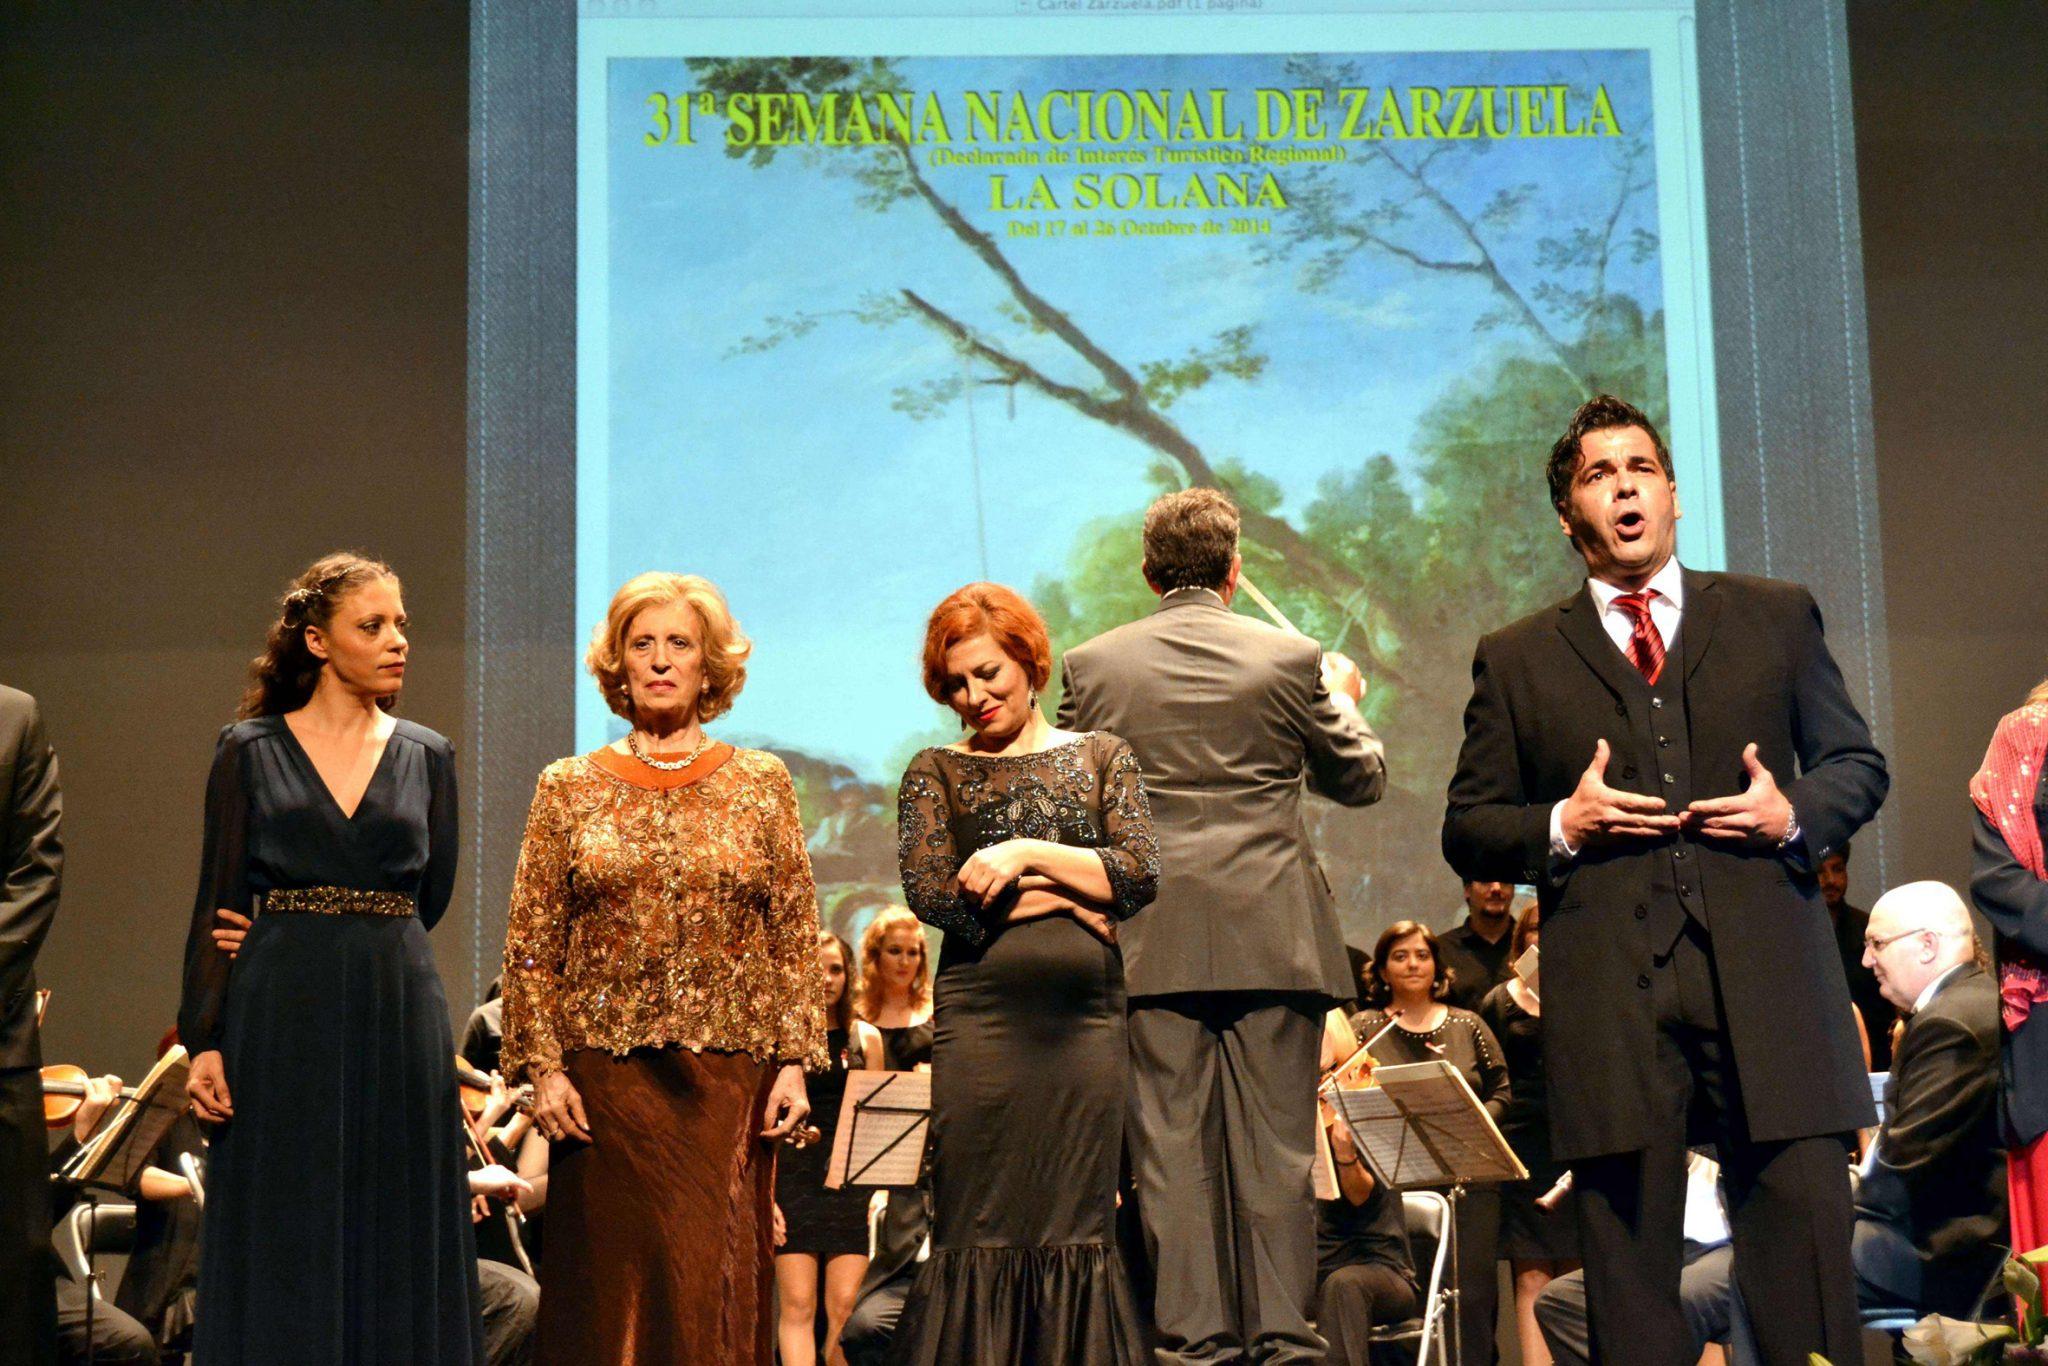 zarzuela La Solana 2 gala lirica canta Antonio Torres